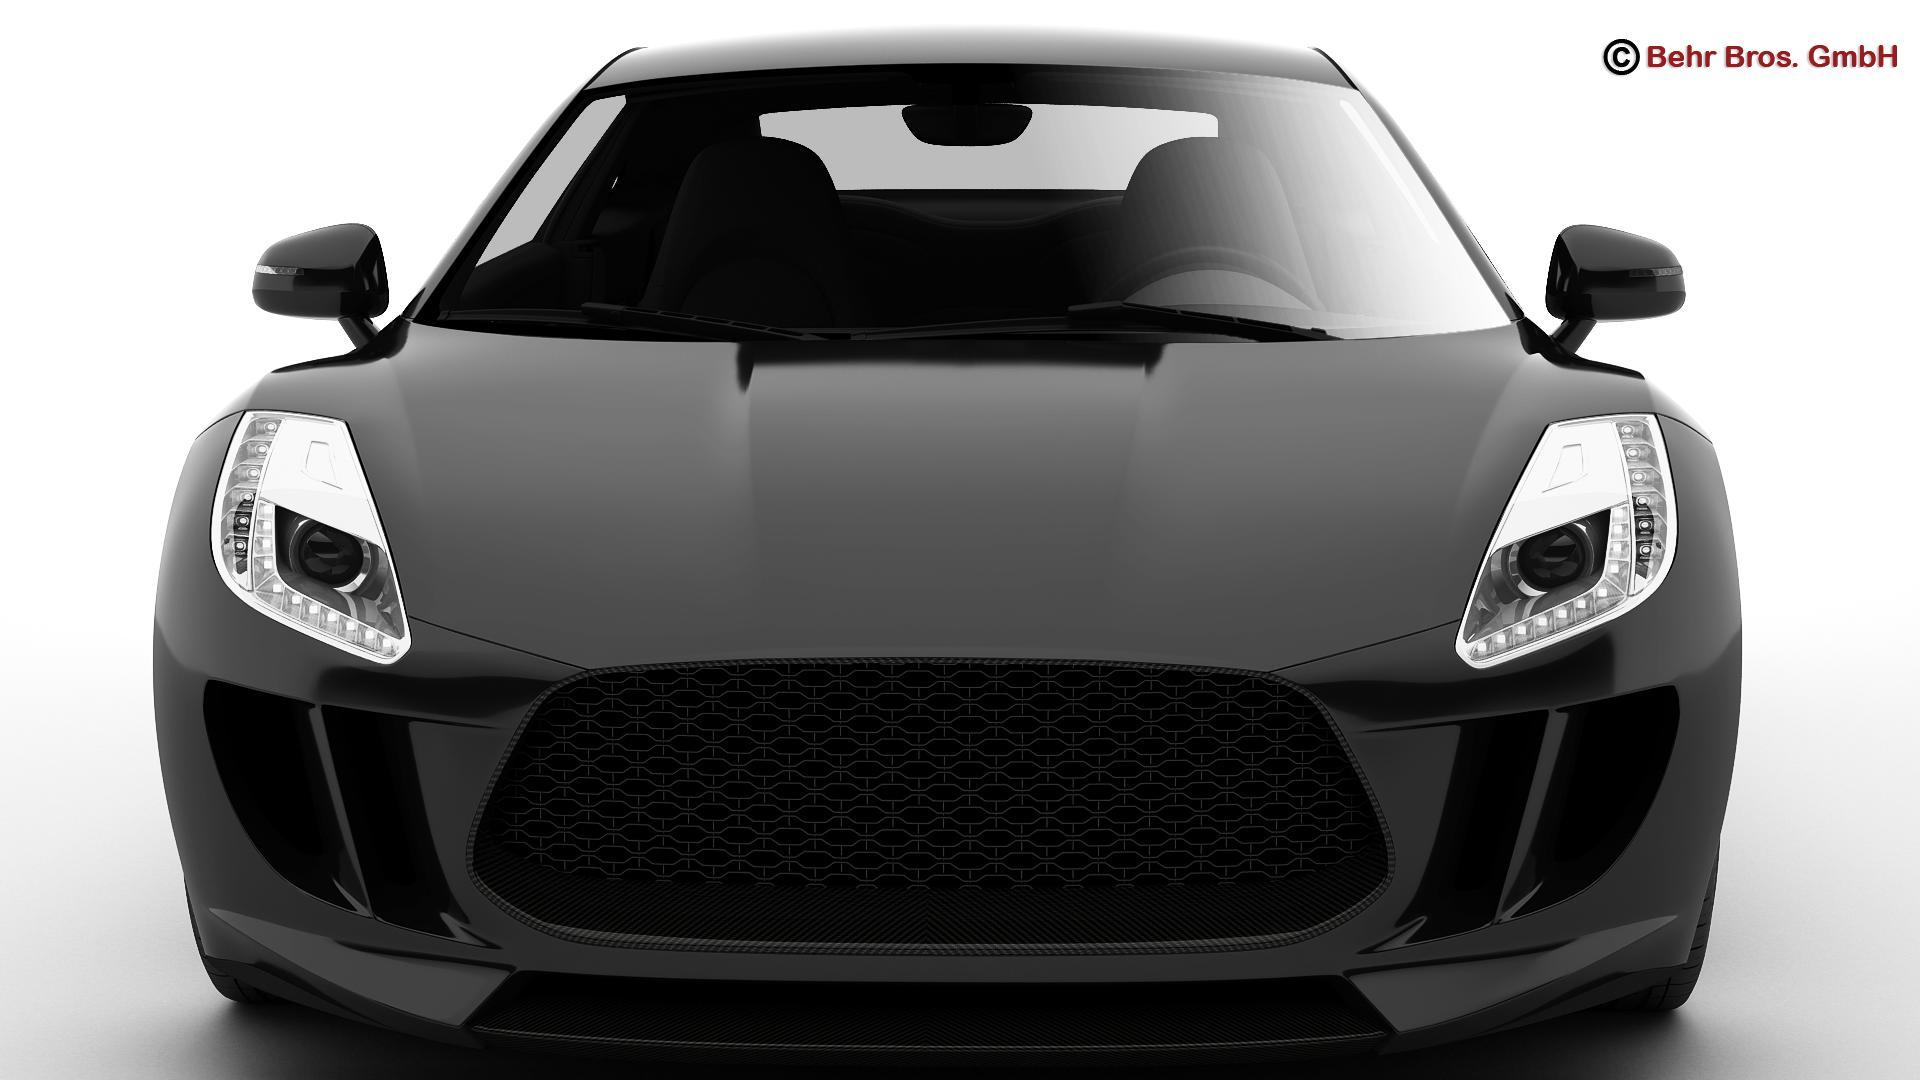 generic sports car 3d model 3ds max fbx c4d lwo ma mb obj 160527